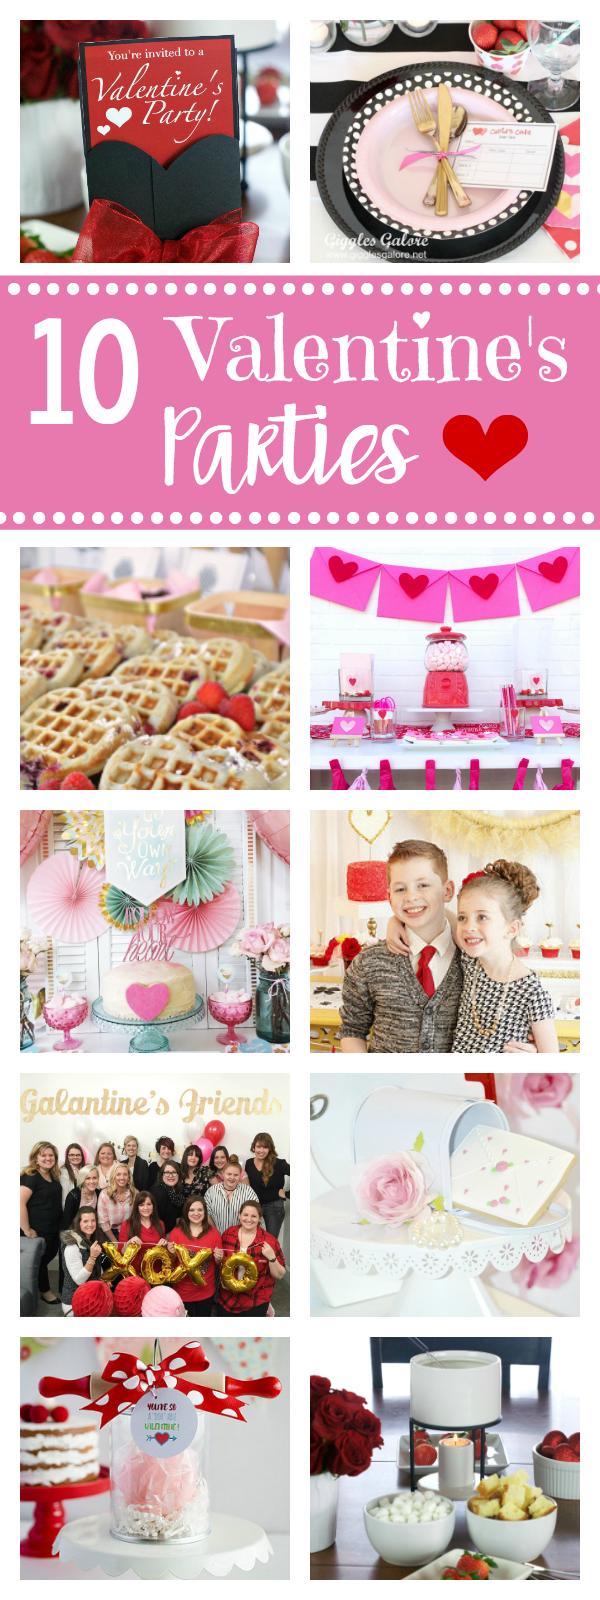 10 Fun Valentine's Parties